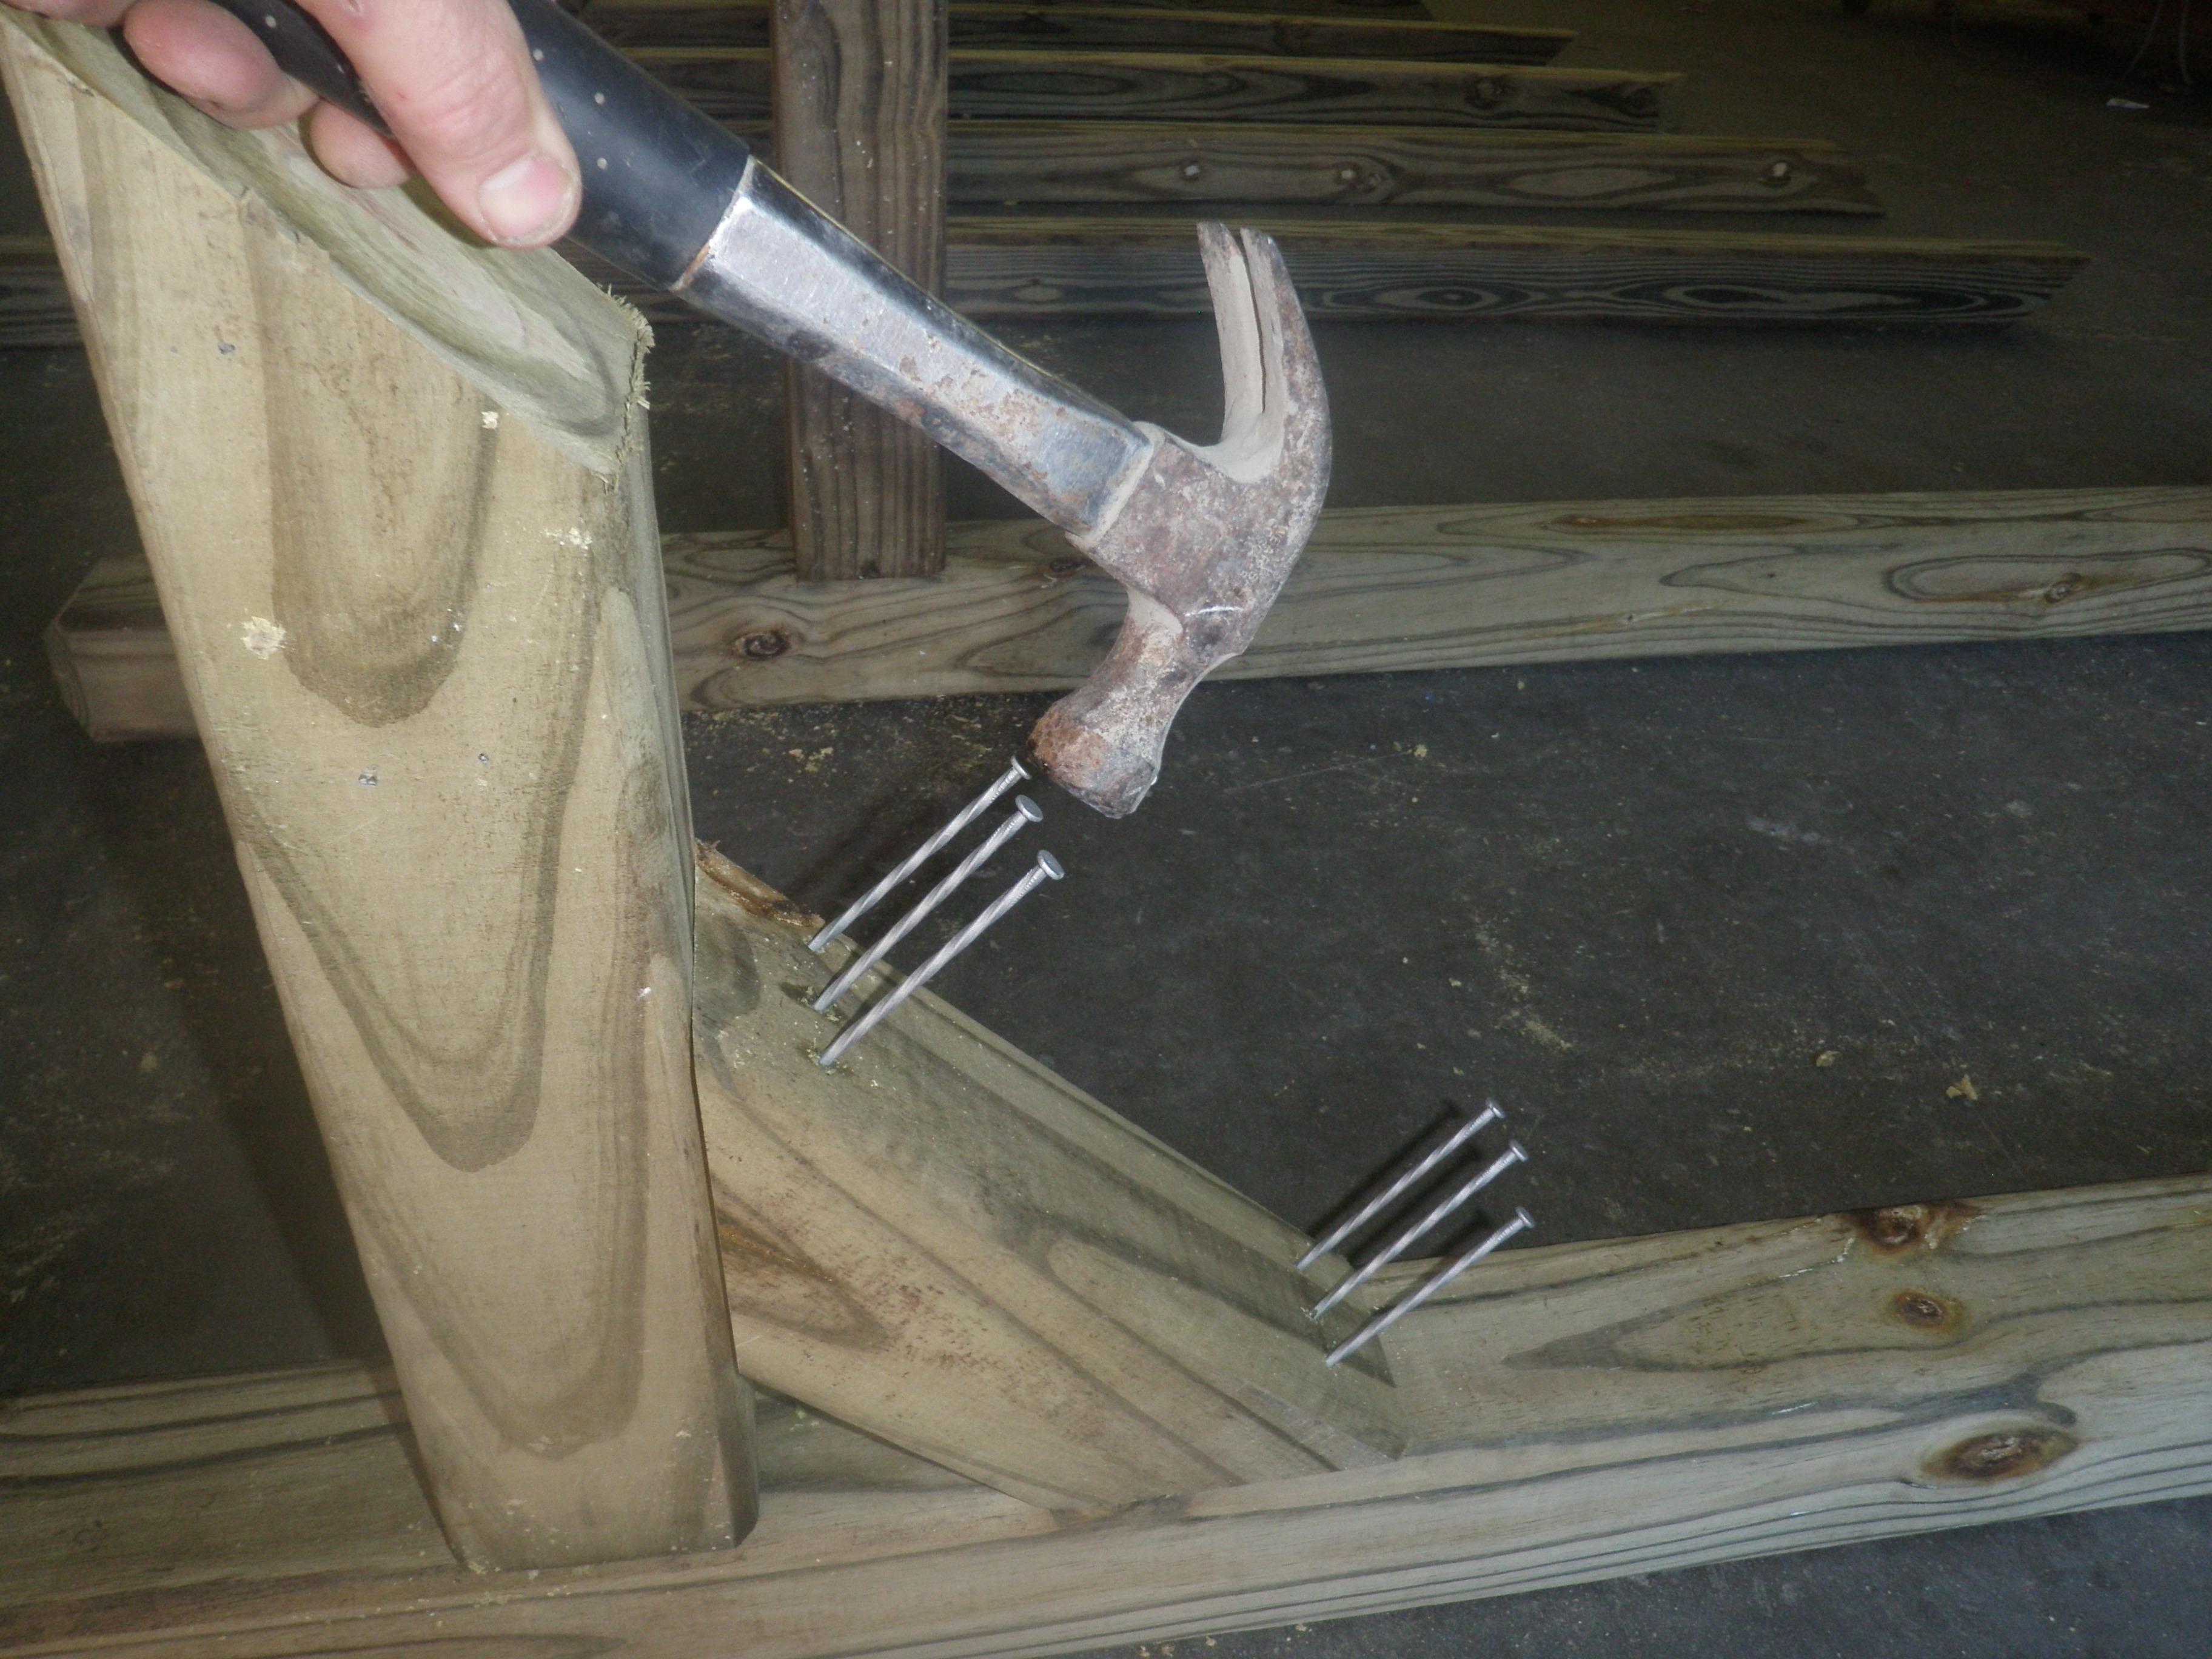 Hammering Twist Nails into the Cross Brace Mailbox Post